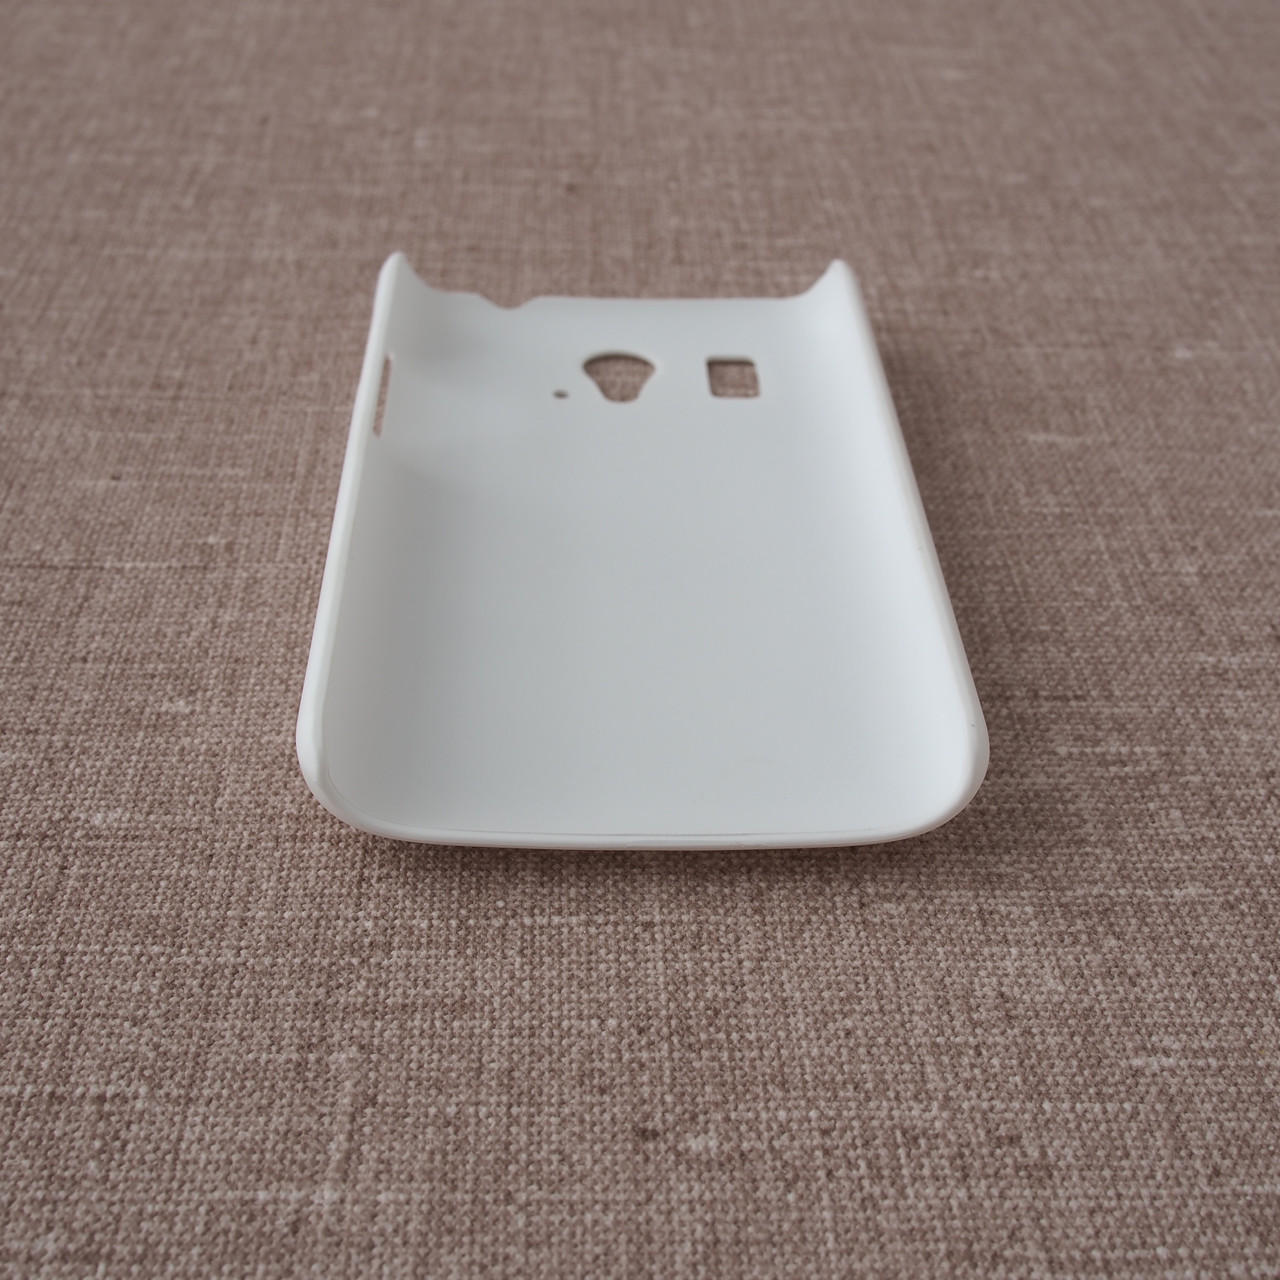 Накладка Nillkin Super Frosted Shield Huawei U8812D Для телефона